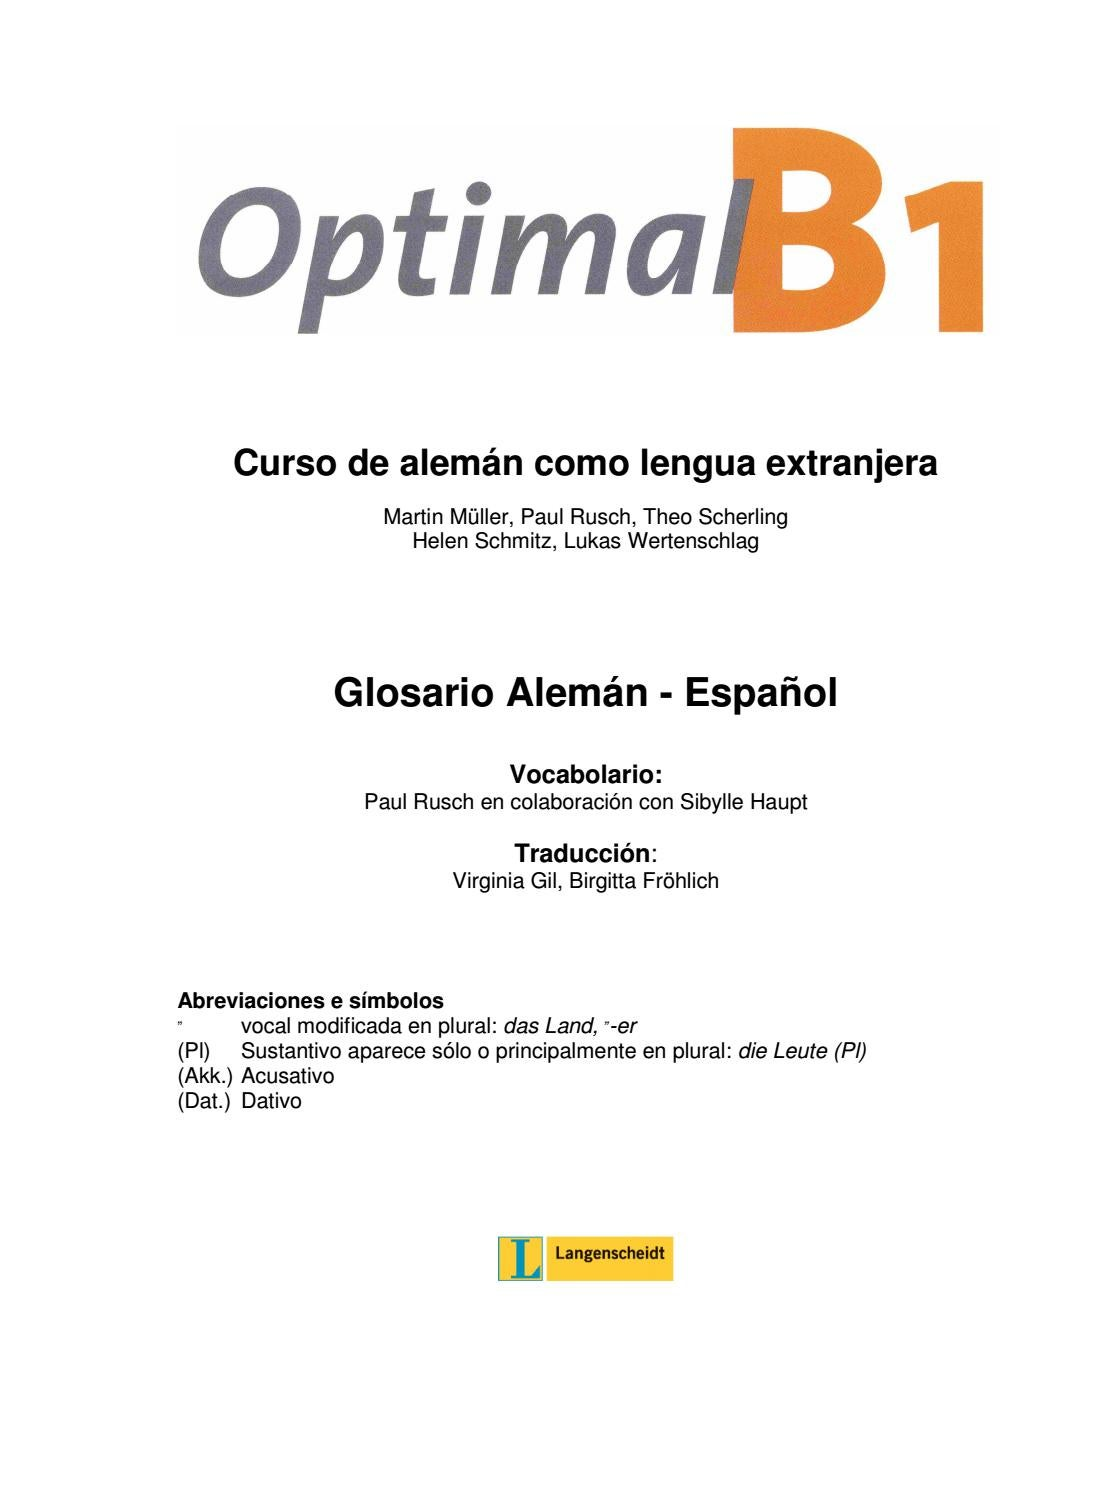 Arbeitsblatt Zu Aspekte 1 Kapitel 7 : Optimal b spanisch by manel pac issuu